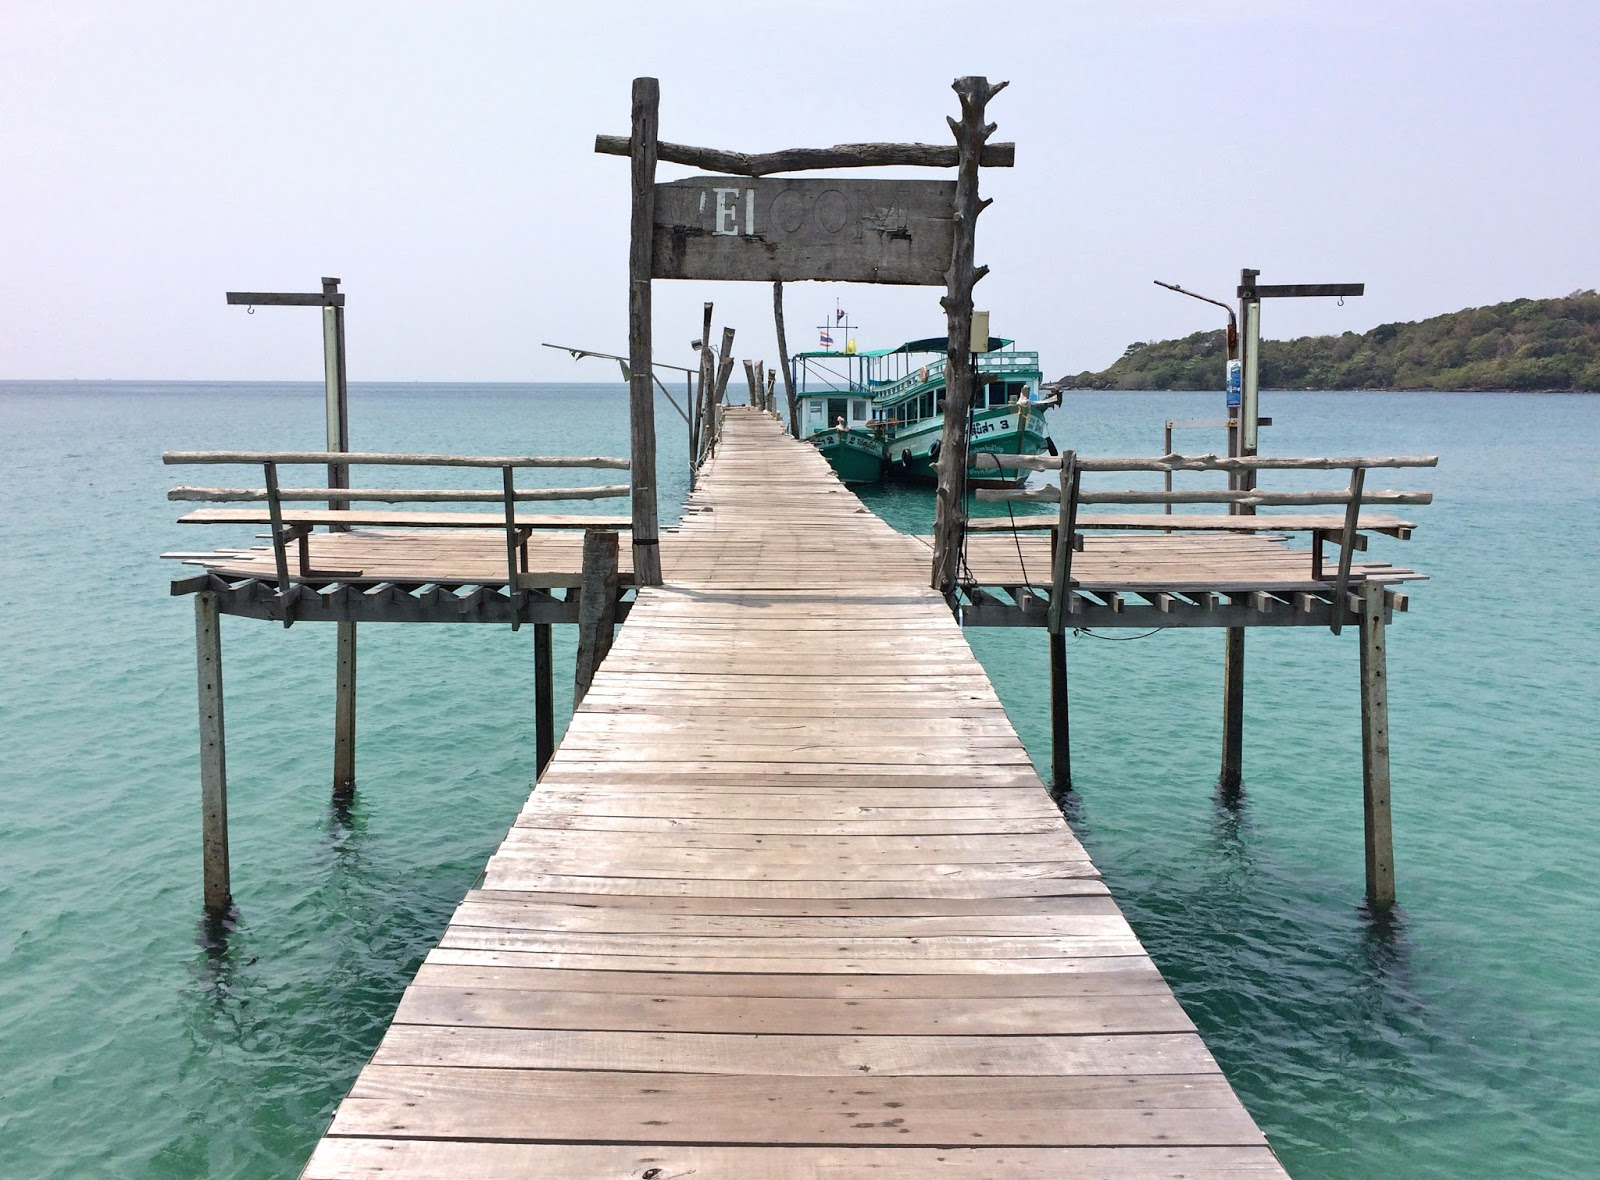 Gdzie na wakacje do Azji - Tajlandia - Koh Kood